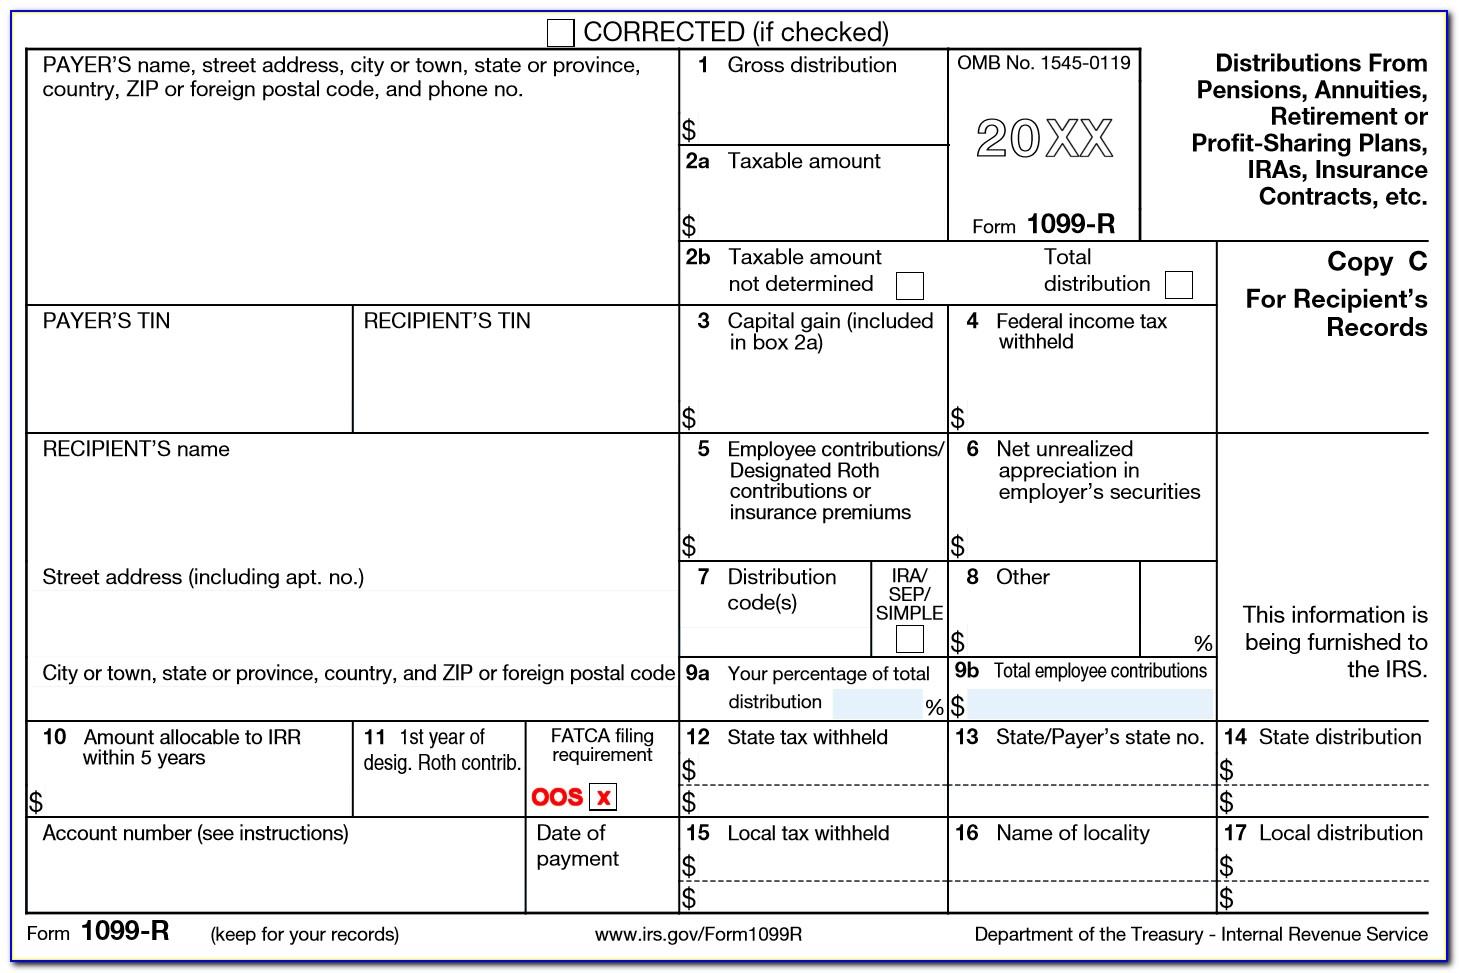 Tax Form 1099 R Distribution Codes